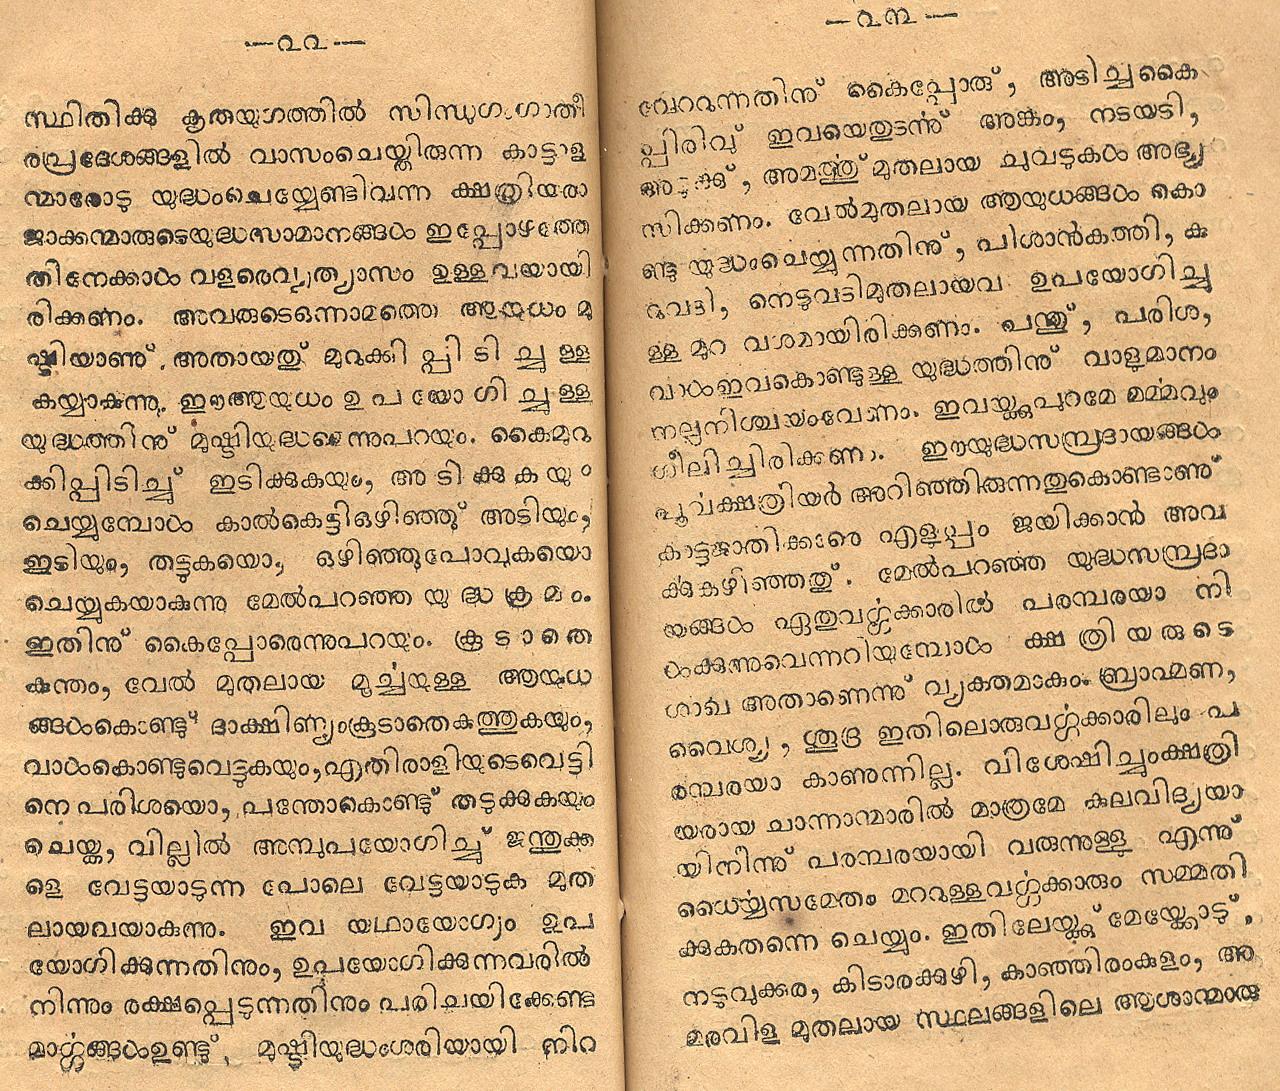 NADARS : THE ROYAL WARRIORS OF SOUTH INDIA | THAMIZHAR THARKAPPU